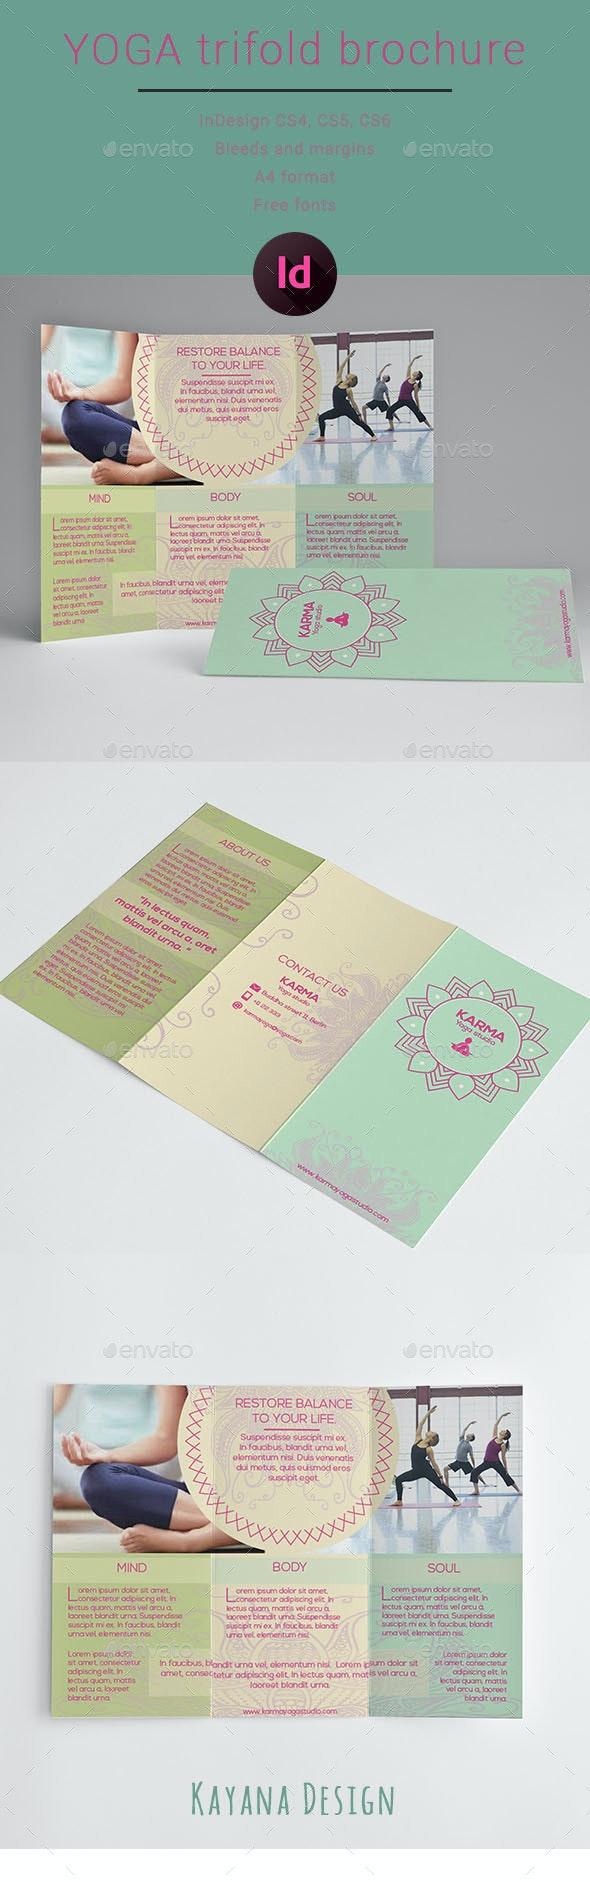 Yoga Trifold Brochure - Brochures Print Templates